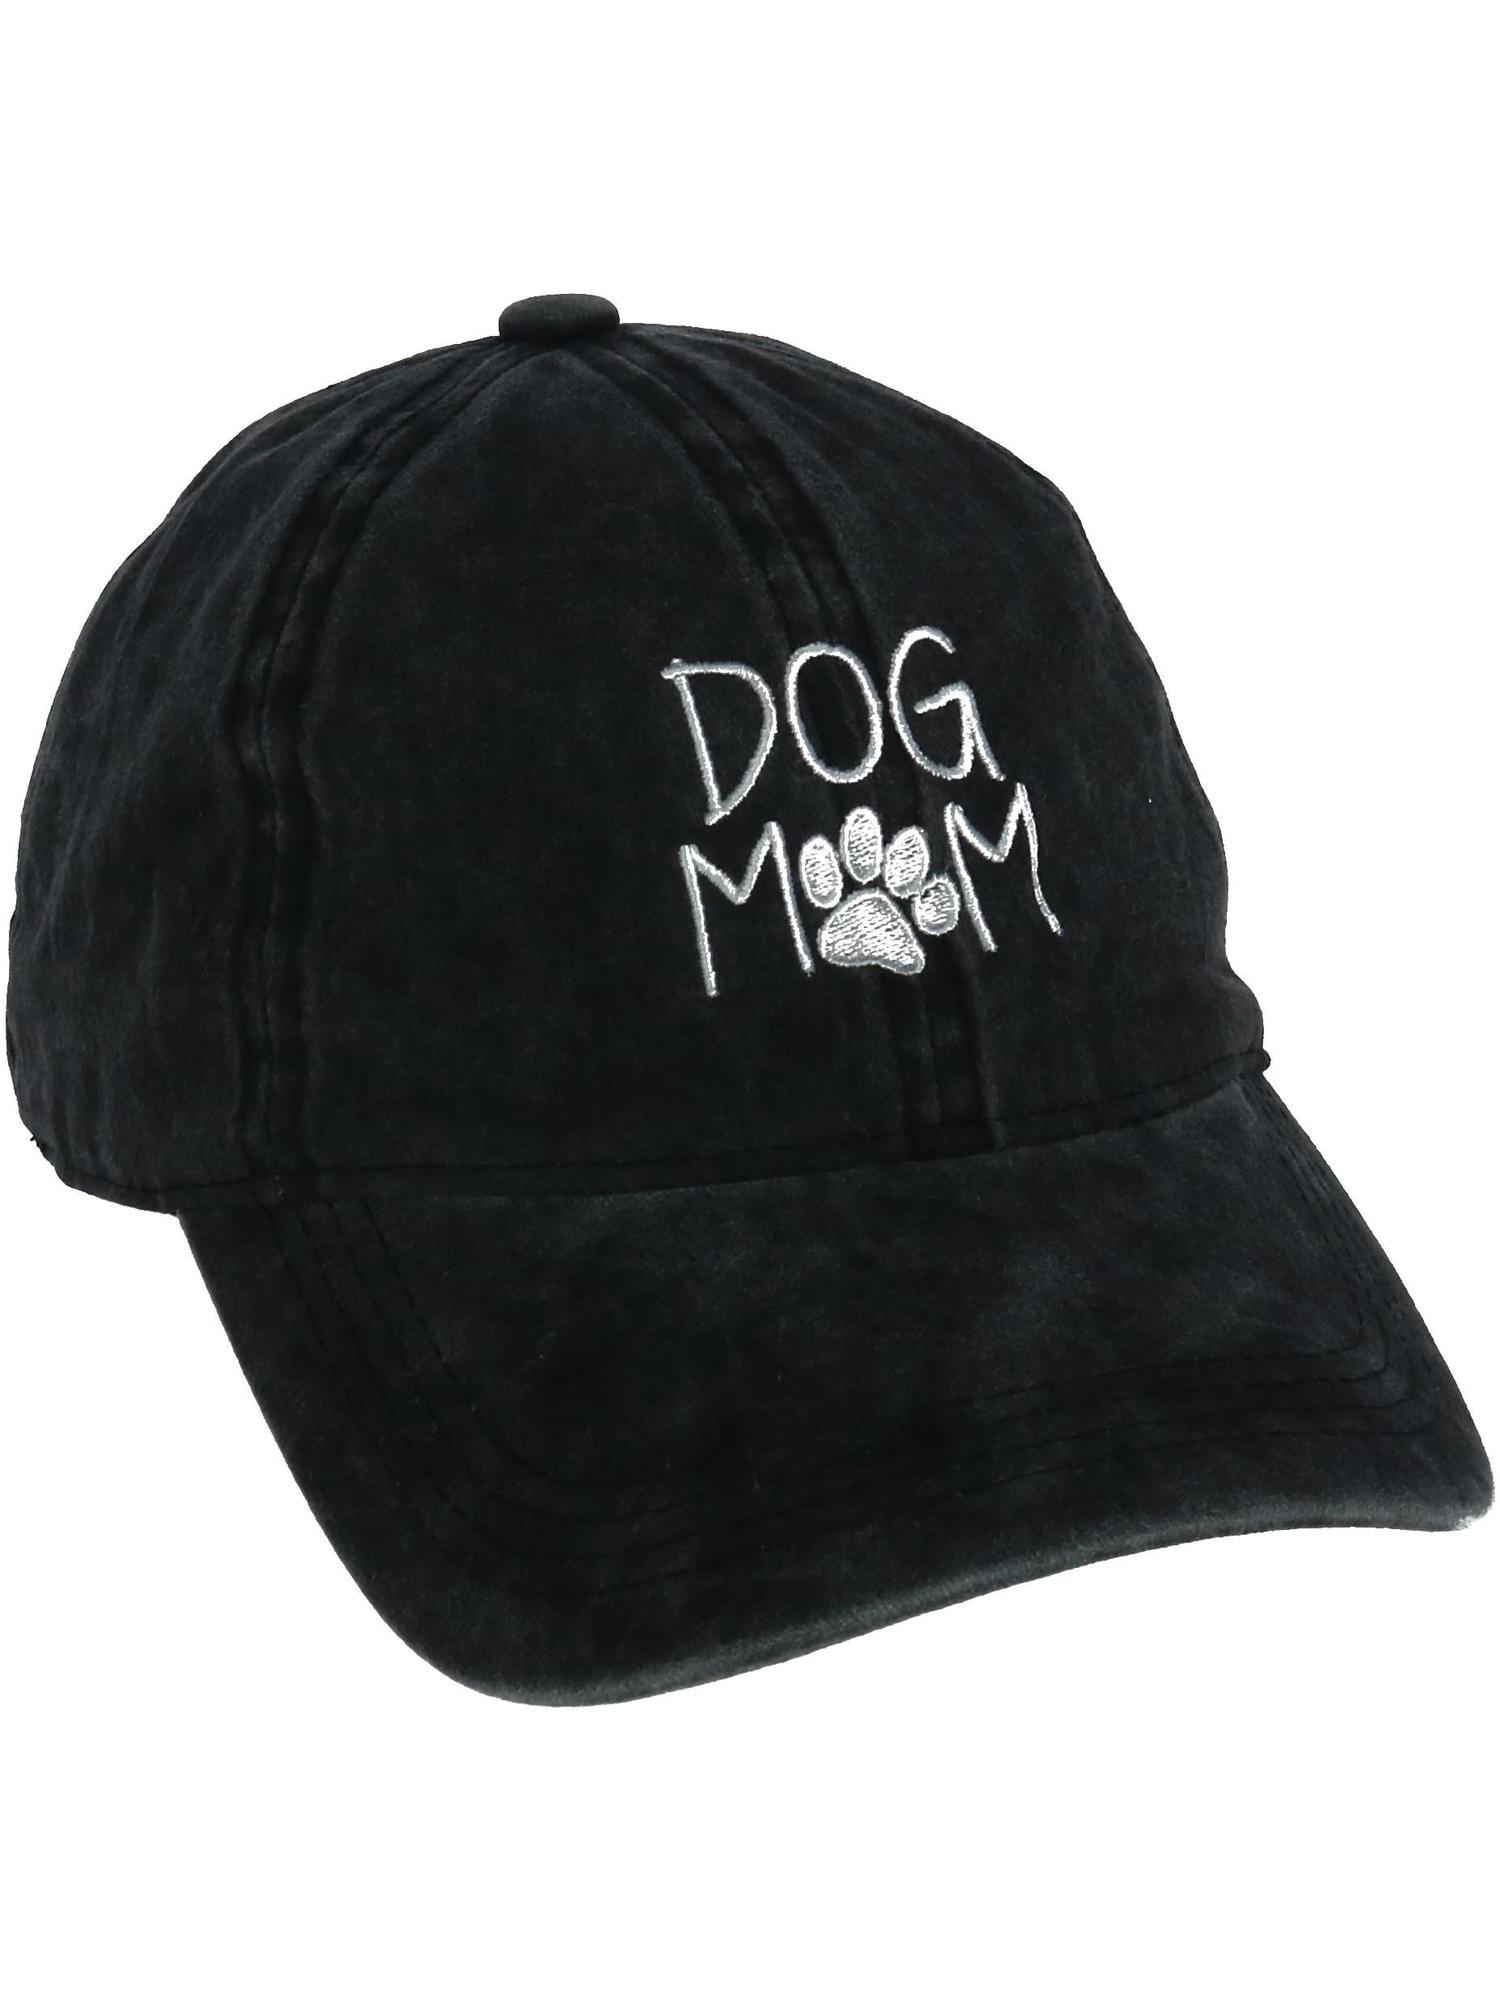 f21ecaea2 Women's Dog Mom Embroidered Baseball Cap